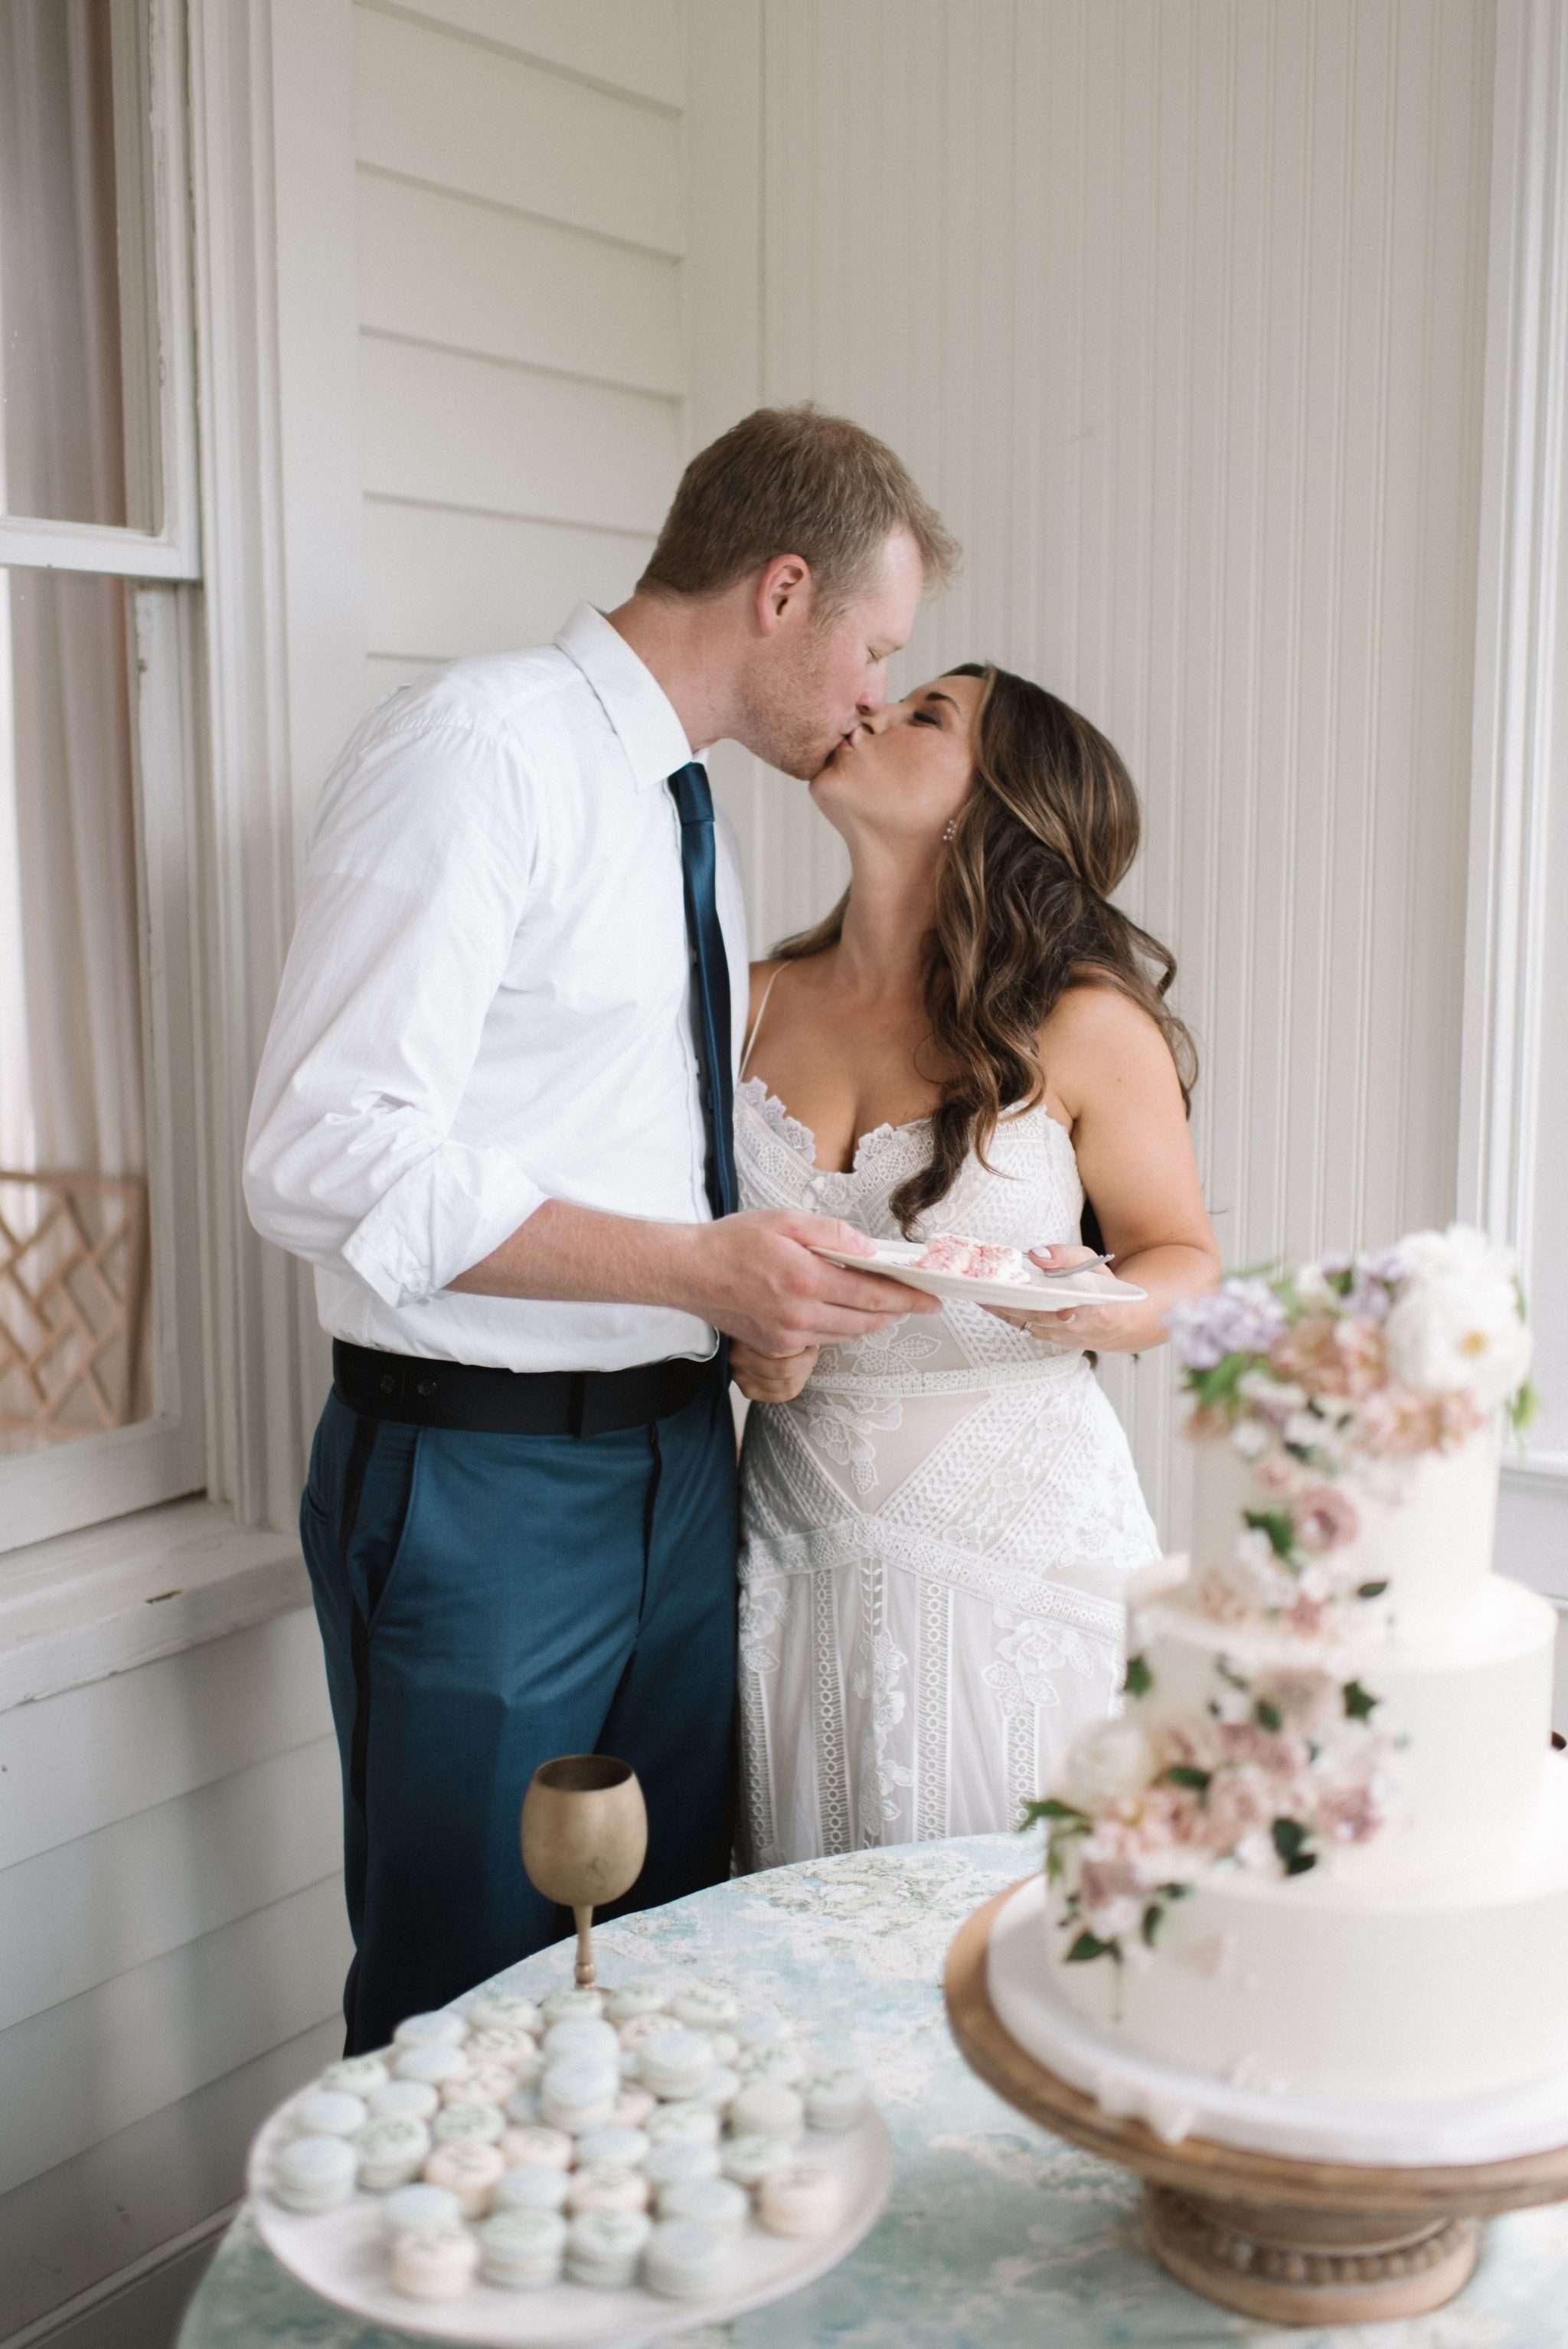 A Charleston-Based Wedding Planner Reveals Secrets Wedding Planners Won't Tell You   Rhyme & Reason